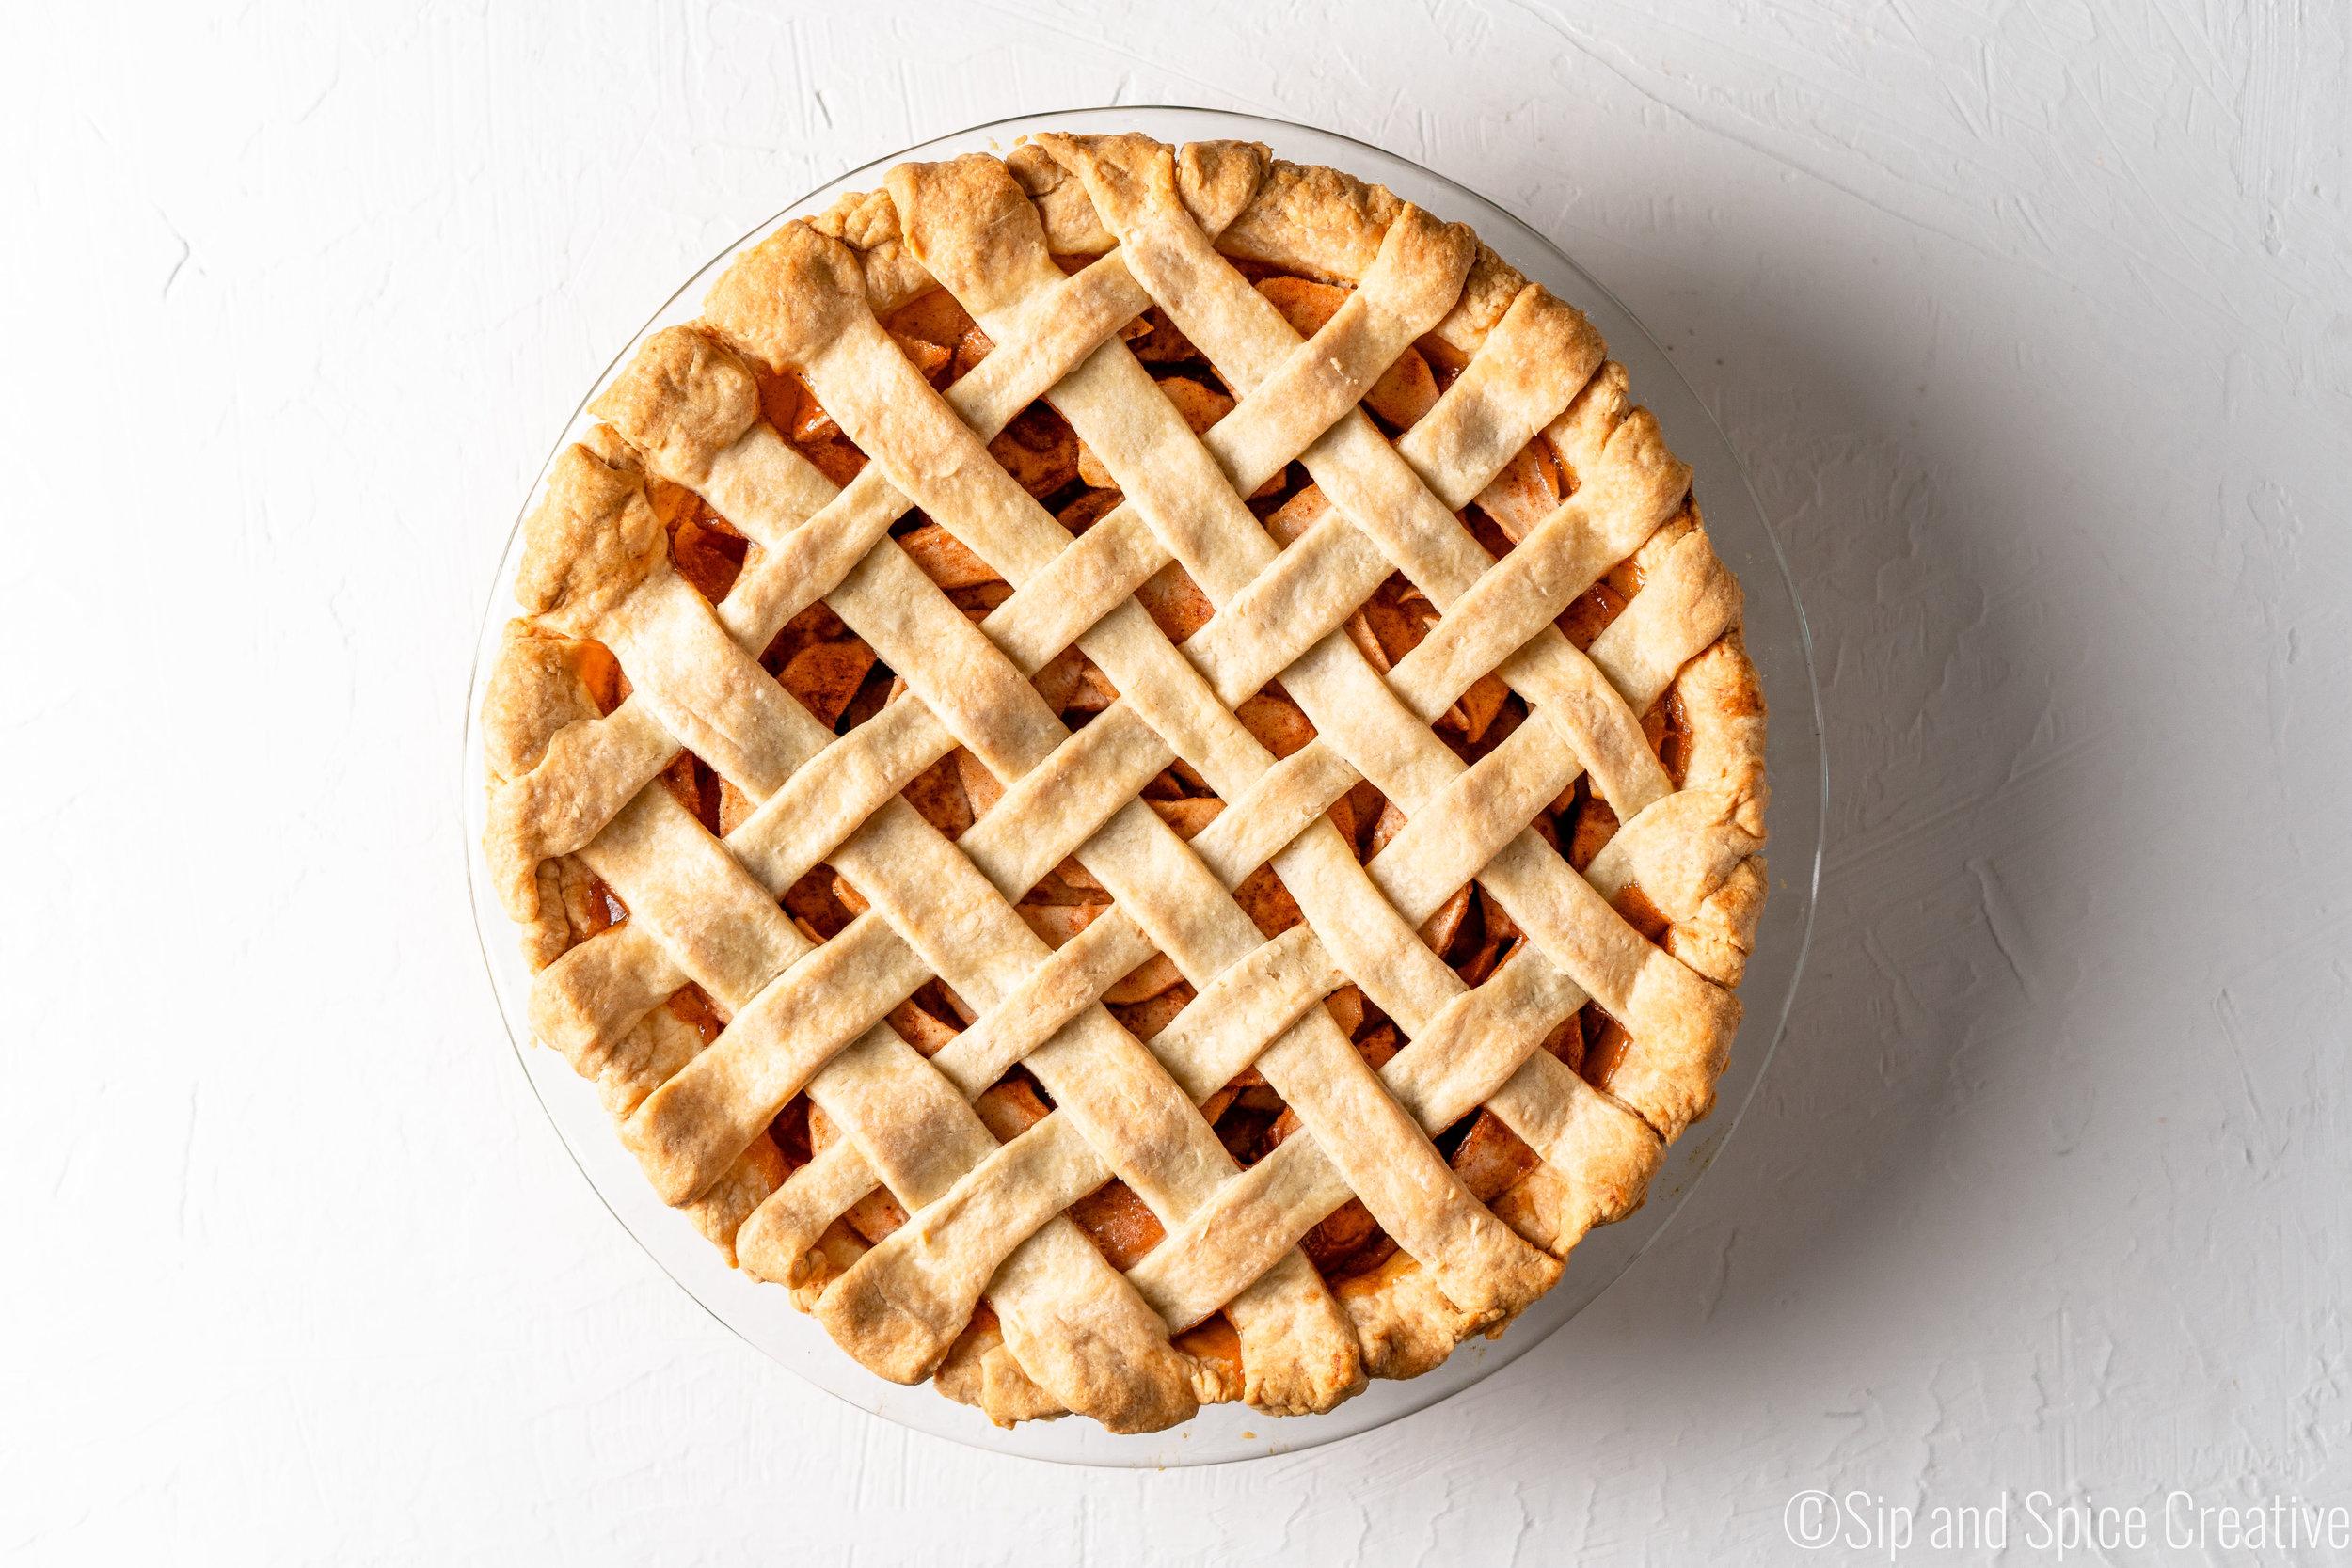 Classic Apple Pie  - Sip and Spice Creative 2.jpg